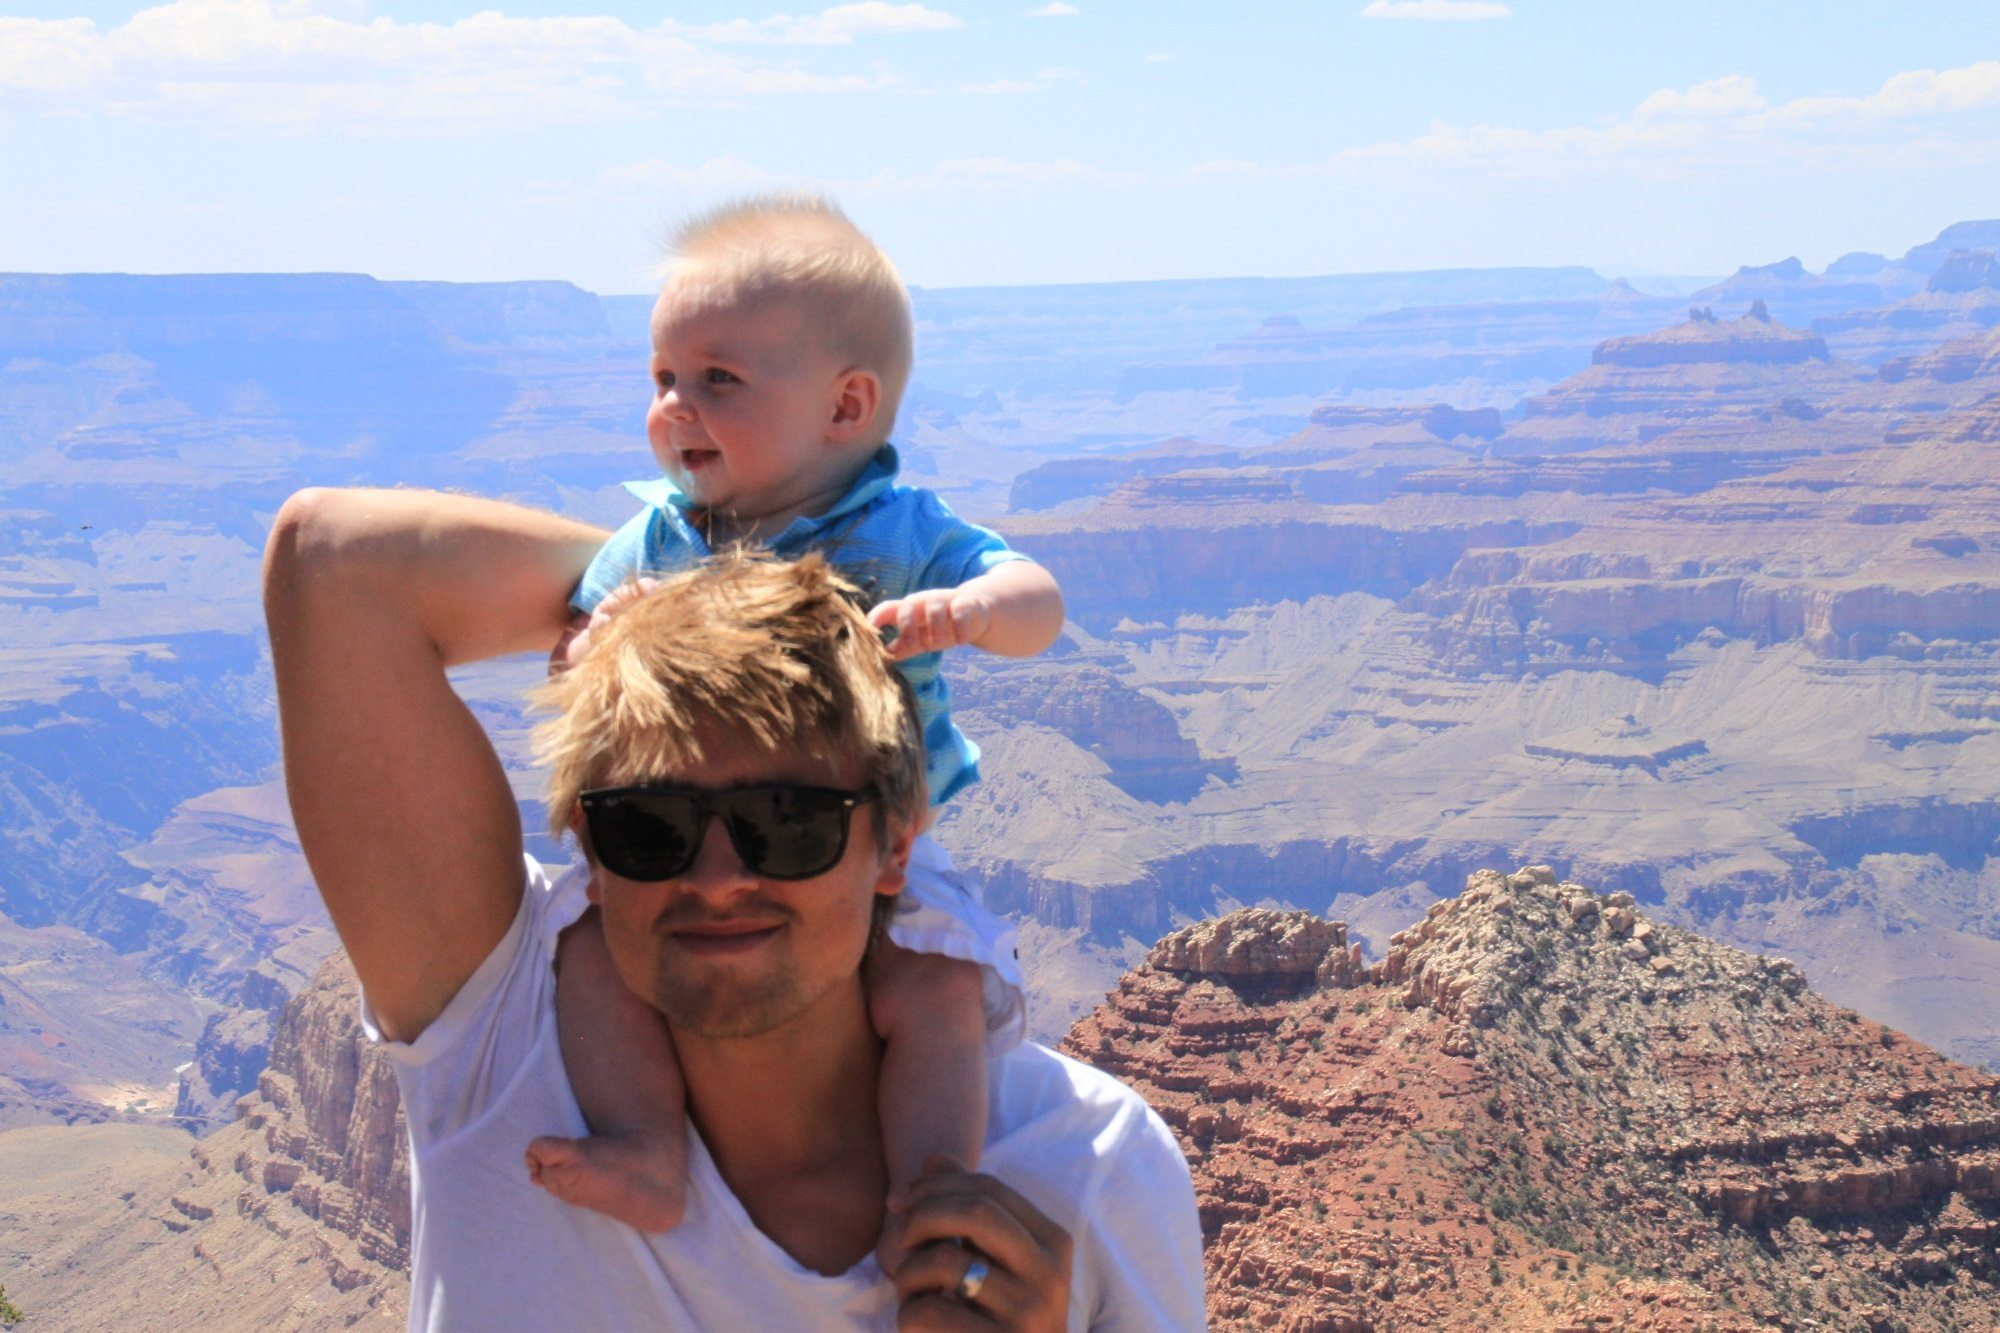 Kids Love Travel: 3 Weken op campervakantie in Amerika